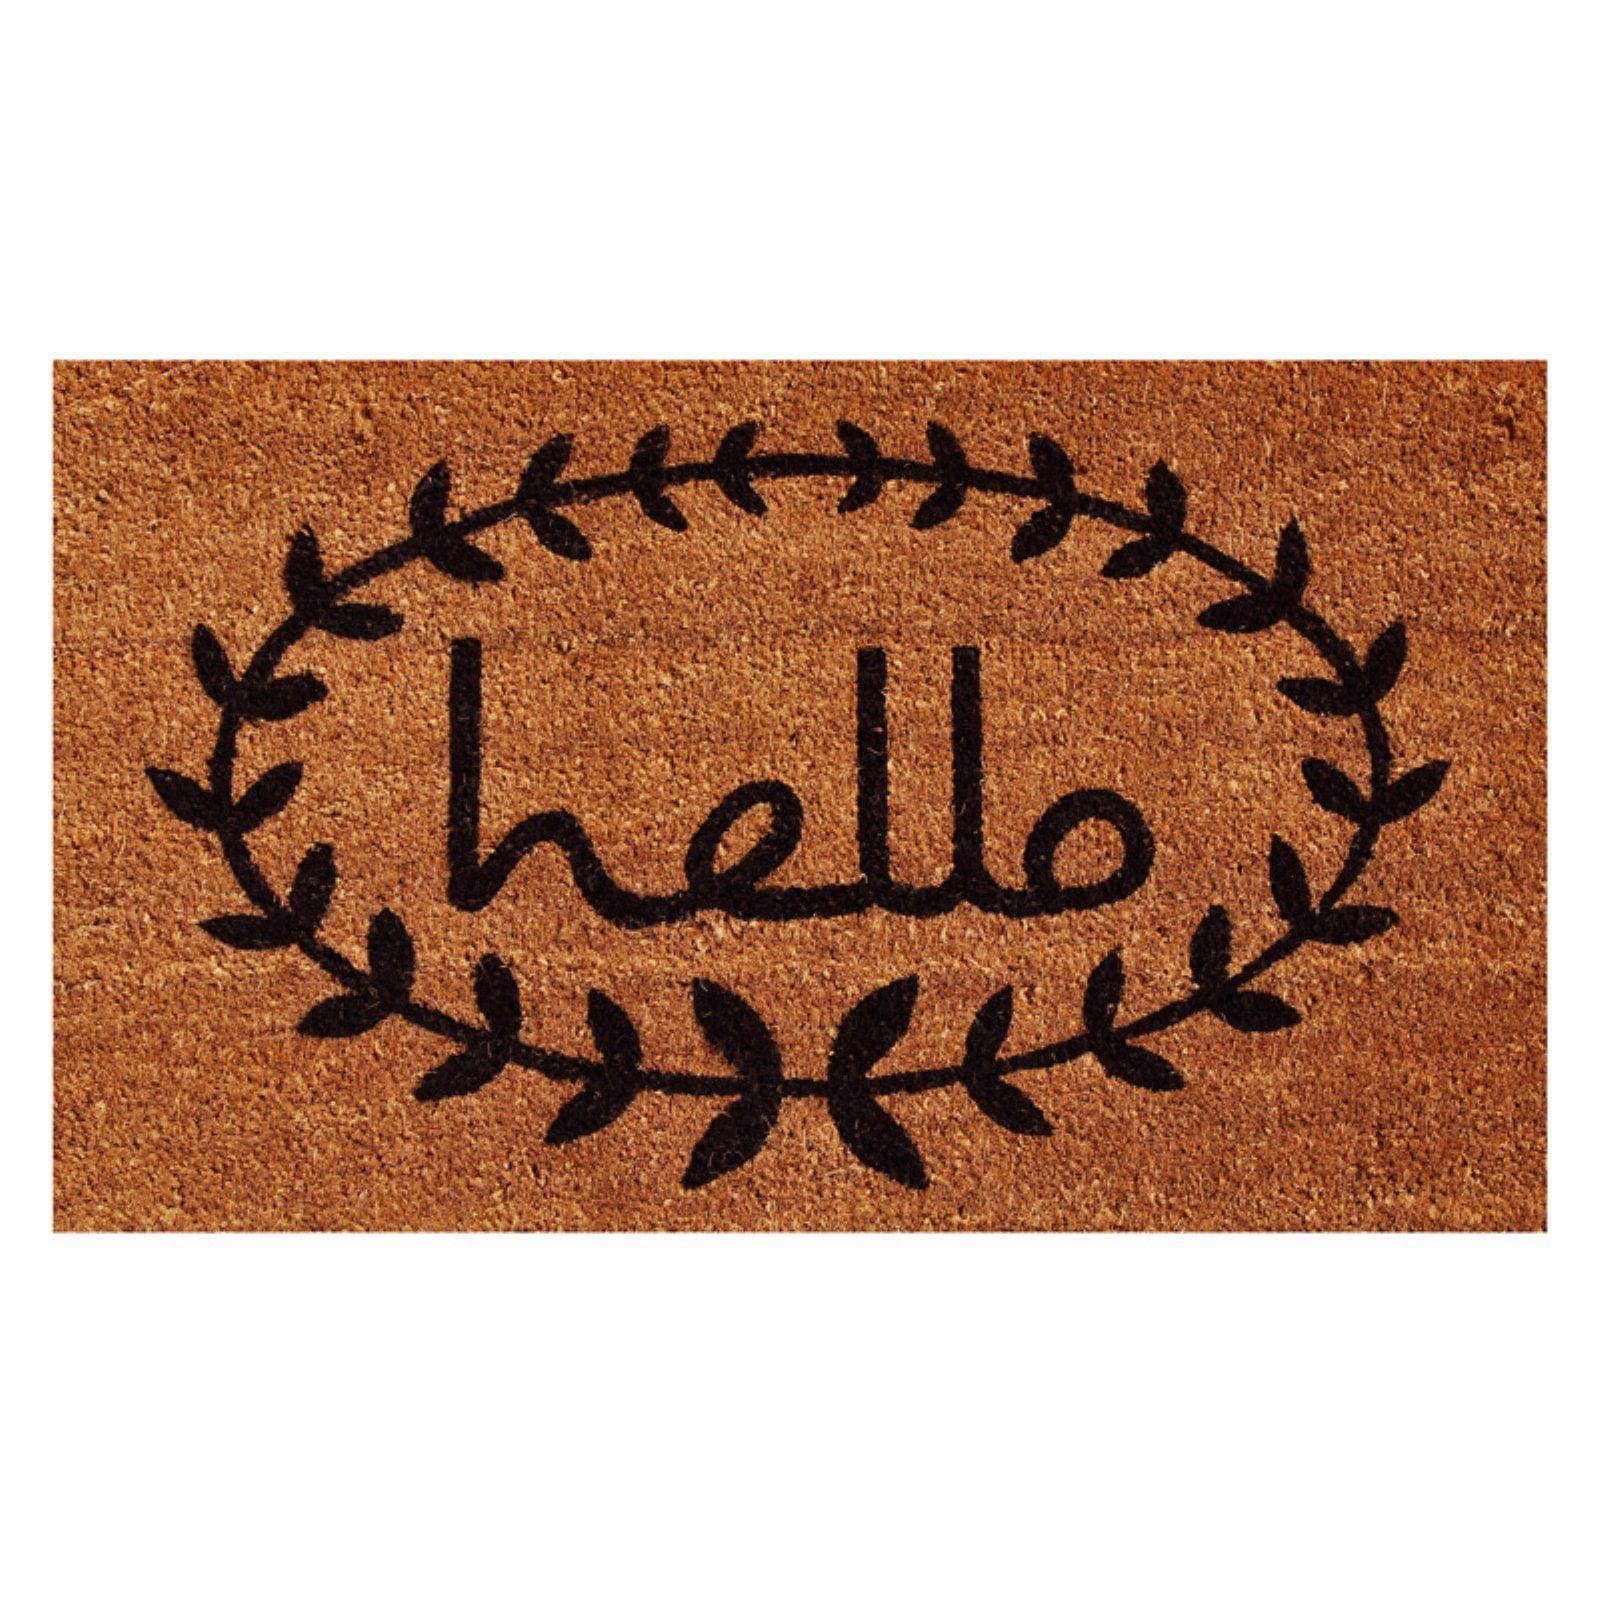 Home & More Hello Doormat by Supplier Generic